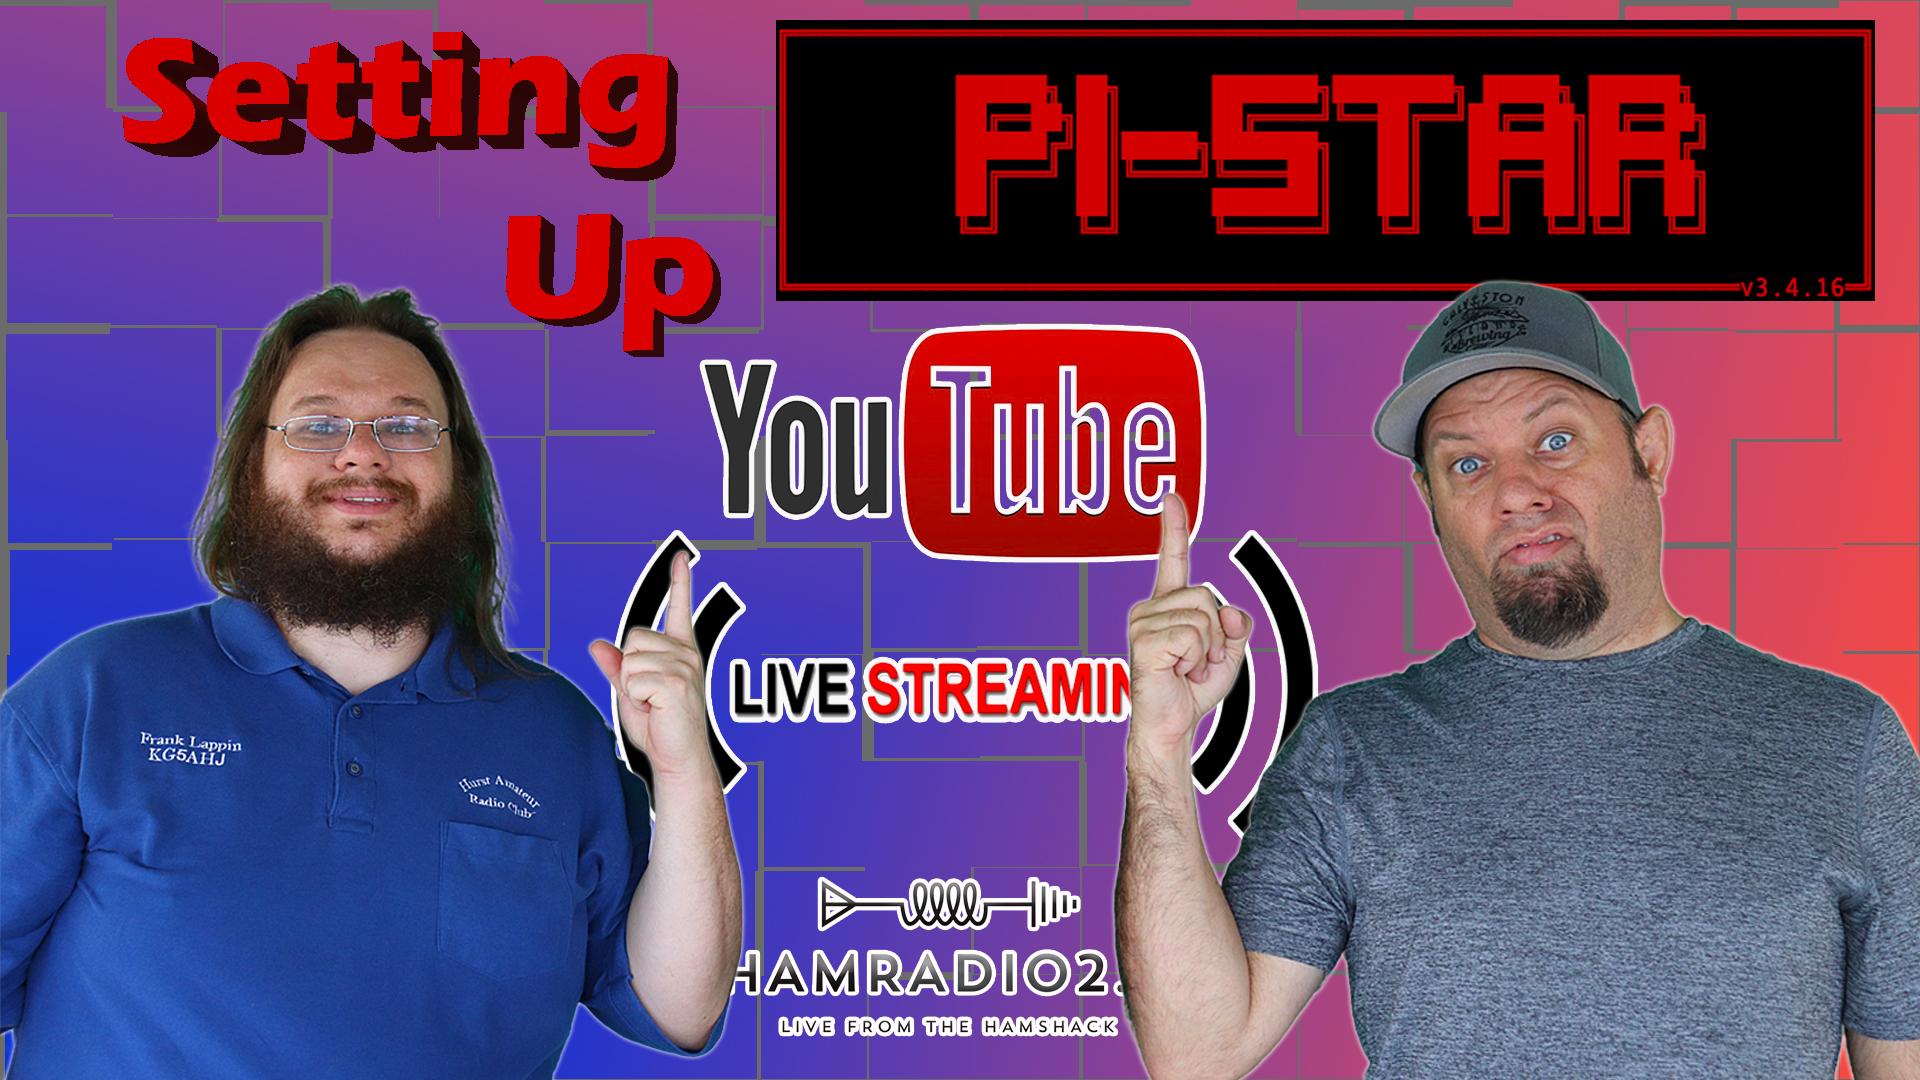 Episode 494: Setting Up Pi Star From Scratch – Ham Radio Livestream